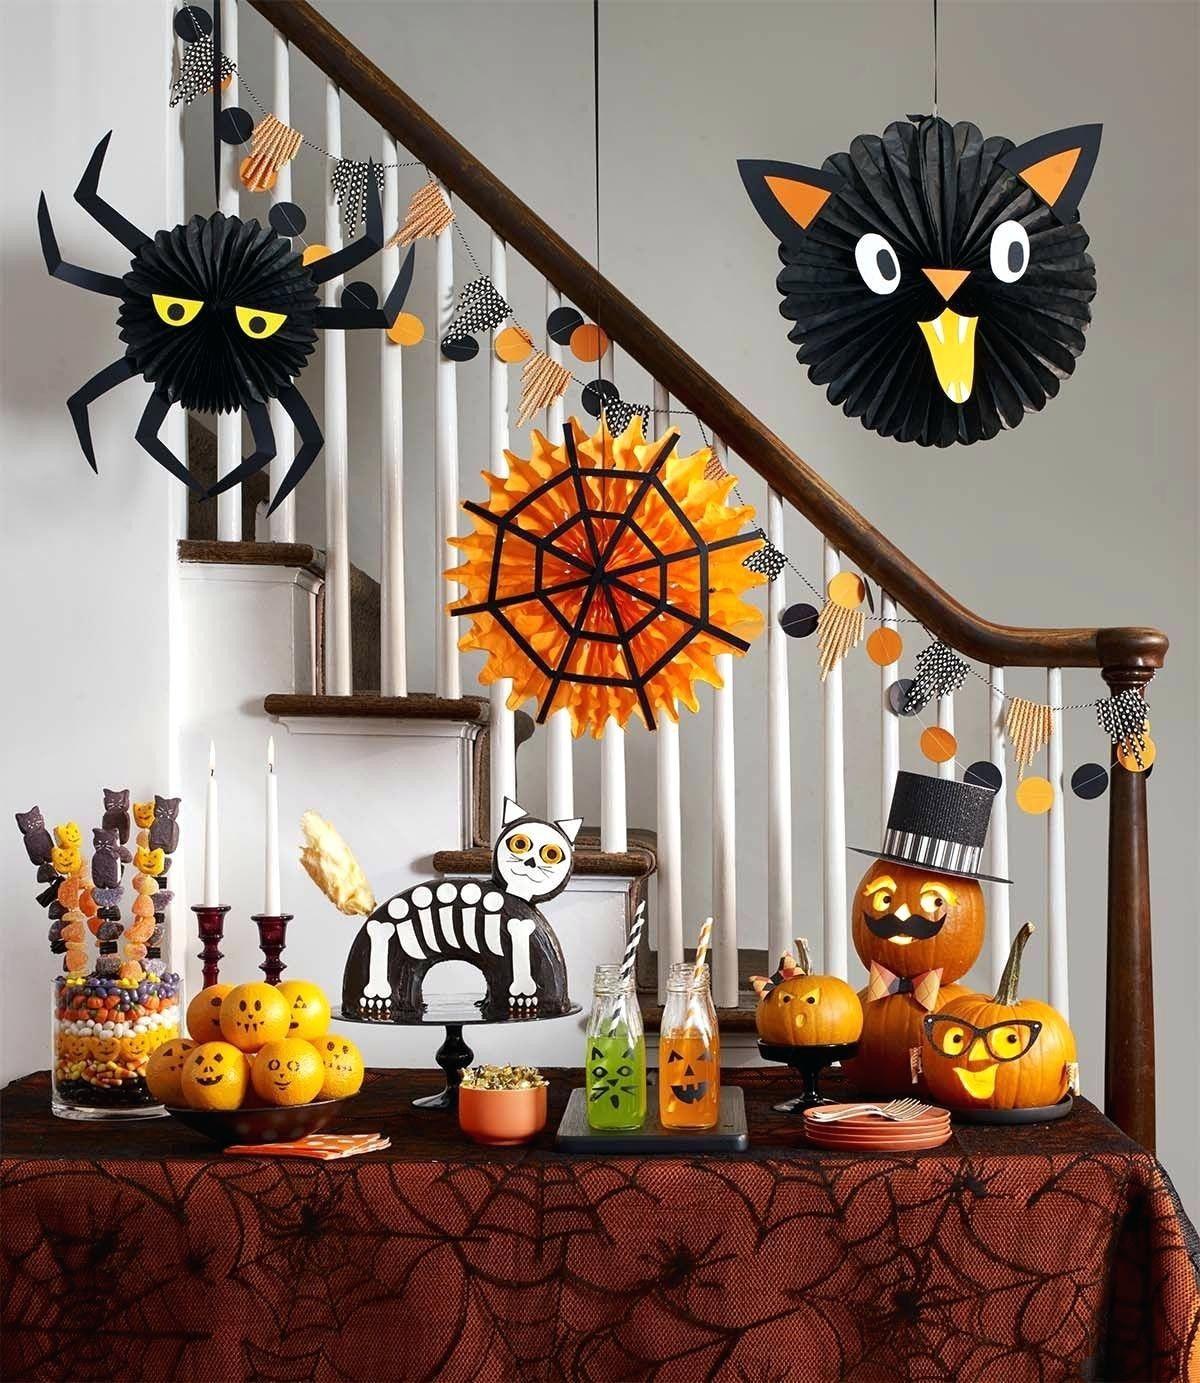 45 Diy Spider Halloween Decoration Ideas Diy Halloween Decorations Fun Diy Halloween Decorations Halloween Decorations Indoor